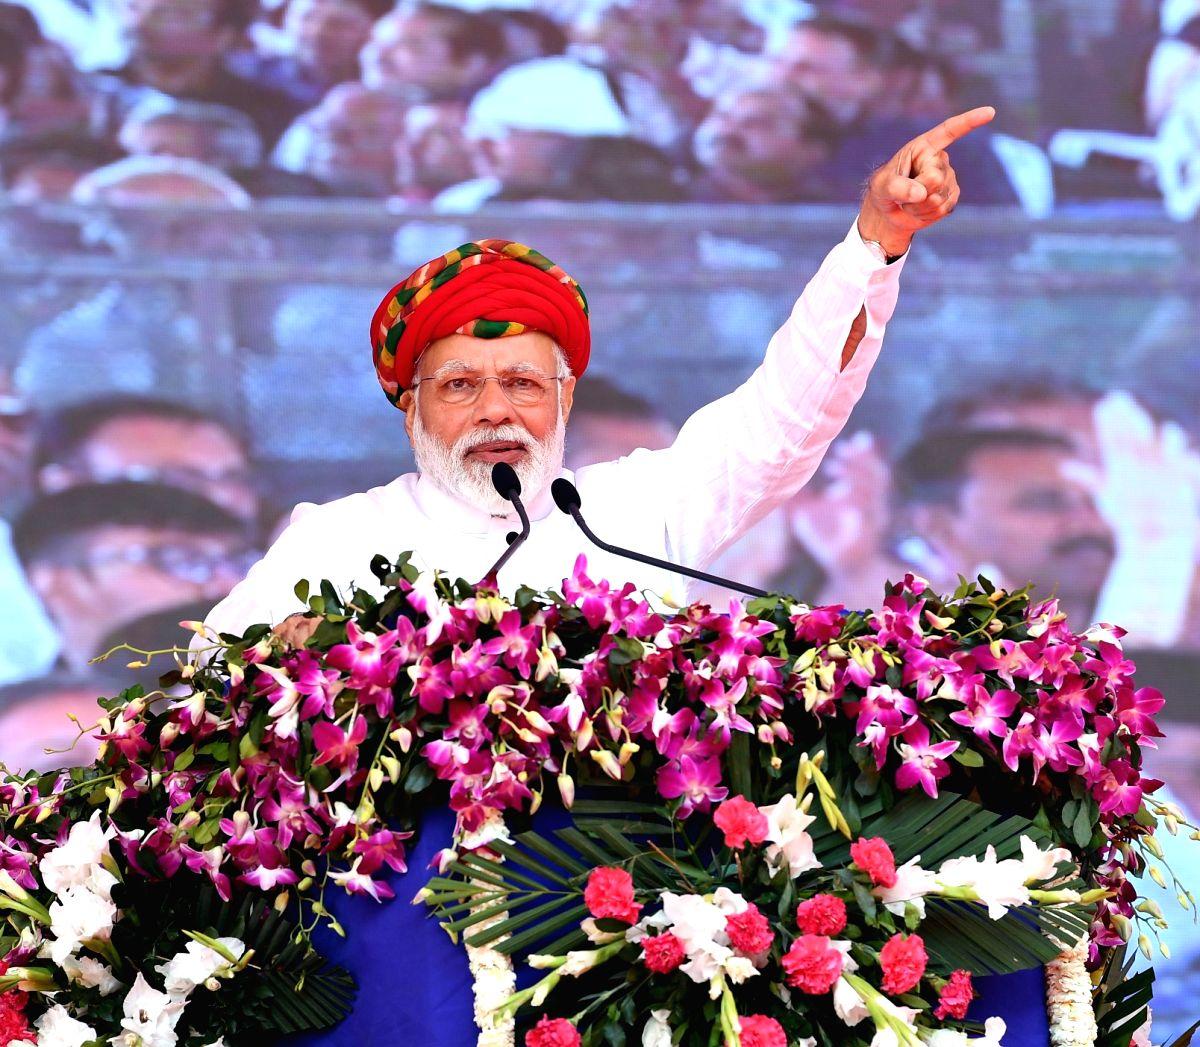 Jamnagar: Prime Minister Narendra Modi addresses at the inauguration of various development projects in Gujarat's Jamnagar, on March 4, 2019. (Photo: IANS/PIB)